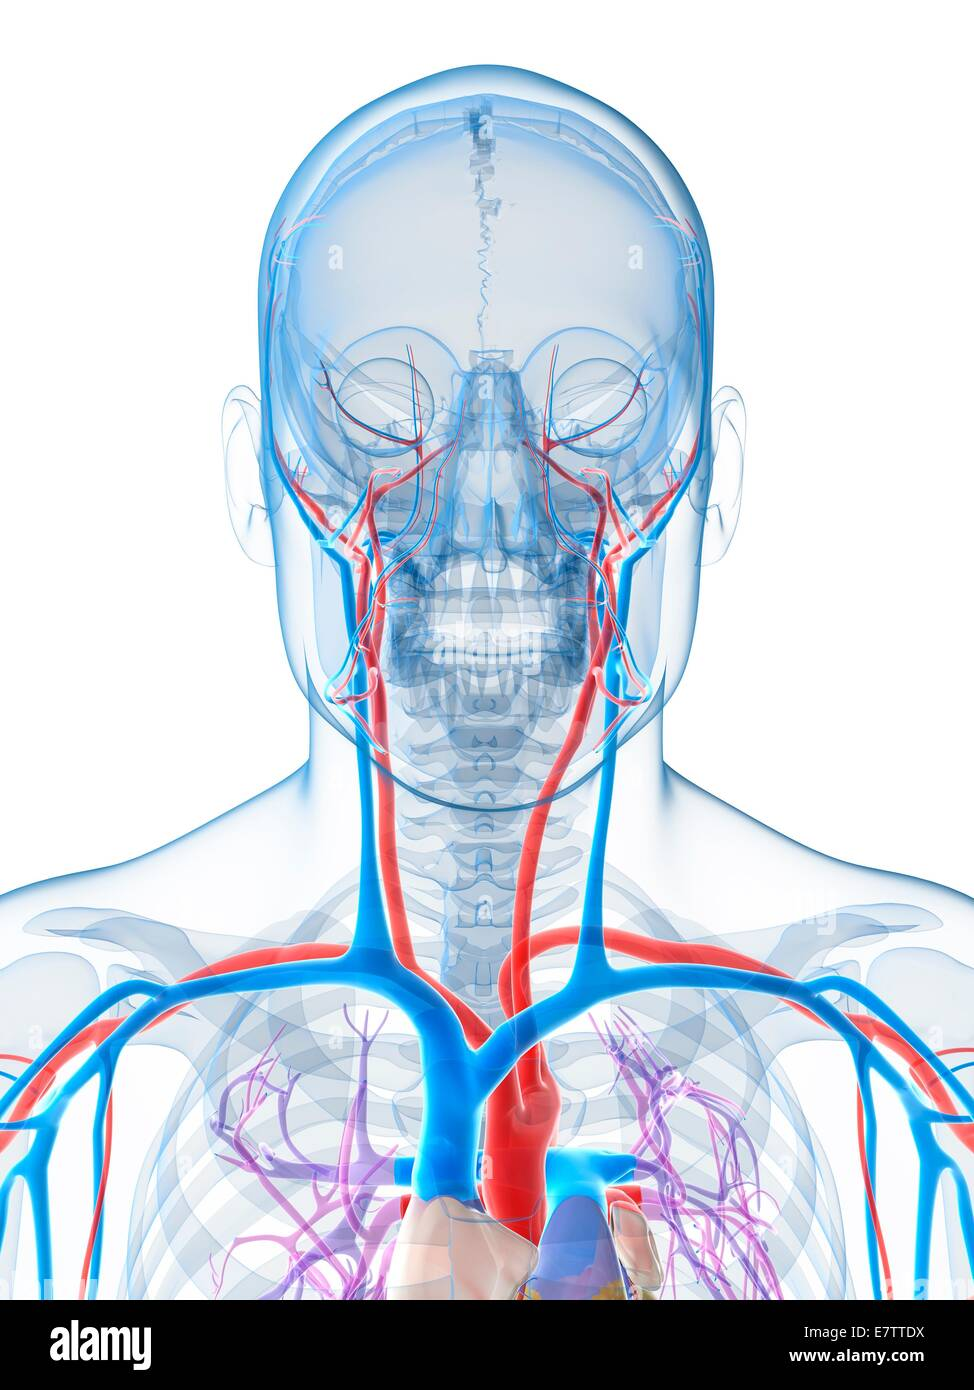 Human Head Arteries Computer Artwork Stock Photos & Human Head ...